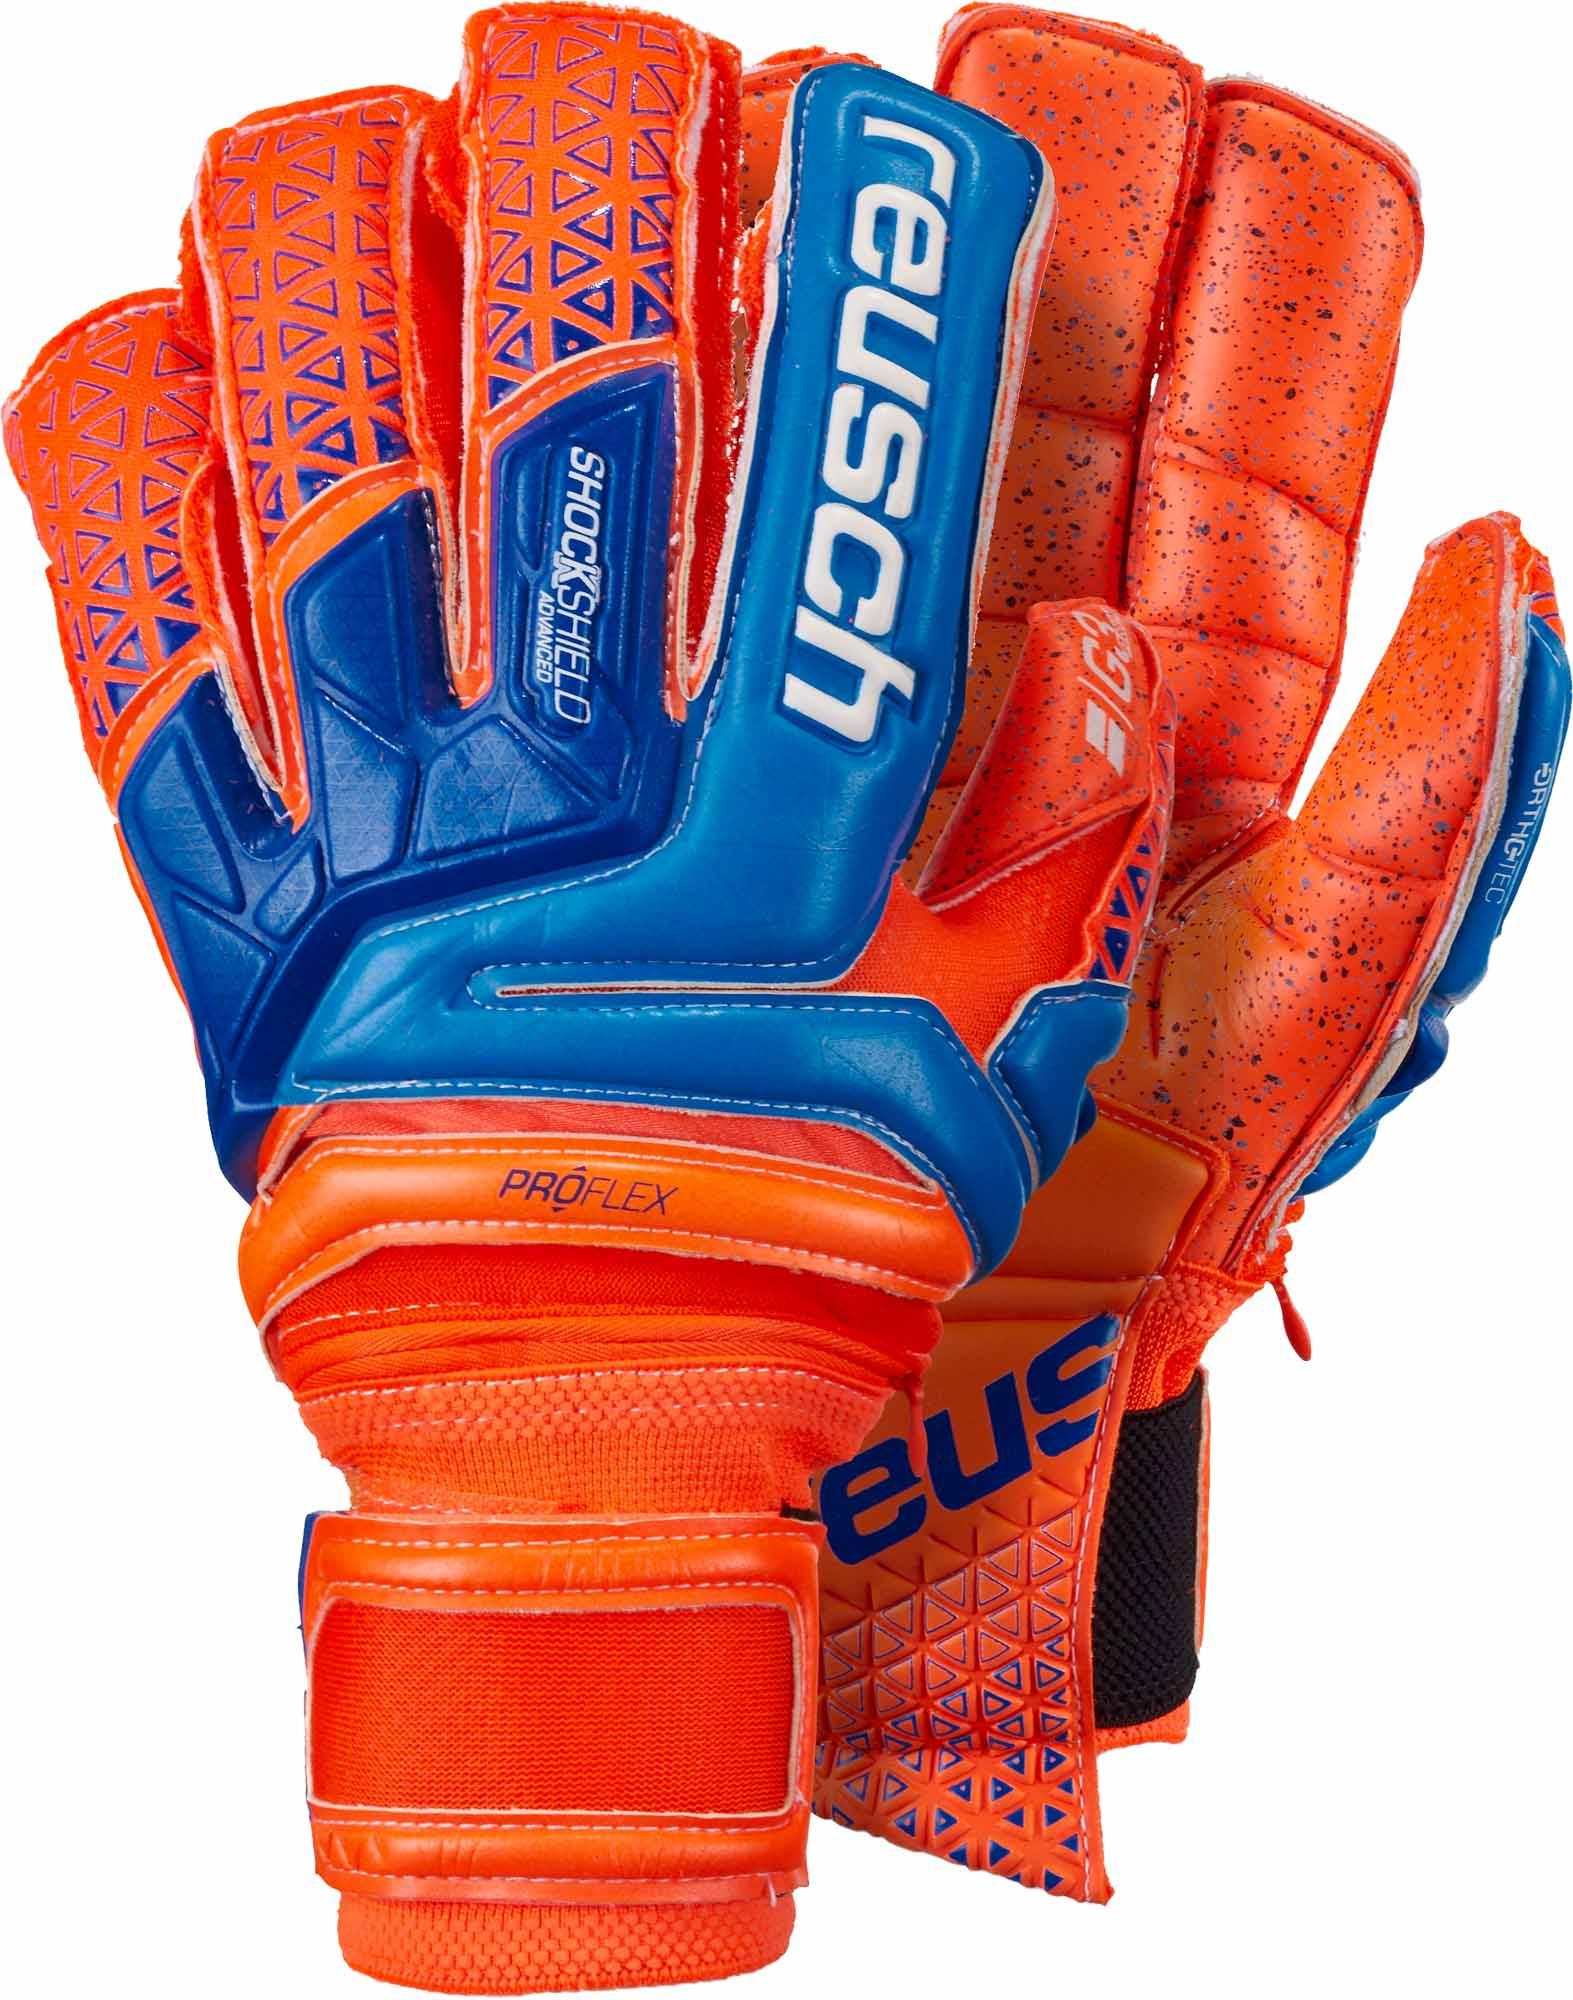 12155da237a Reusch Prisma Supreme G3 Fusion Ortho-Tec Goalkeeper Gloves – Shocking  Orange/Blue